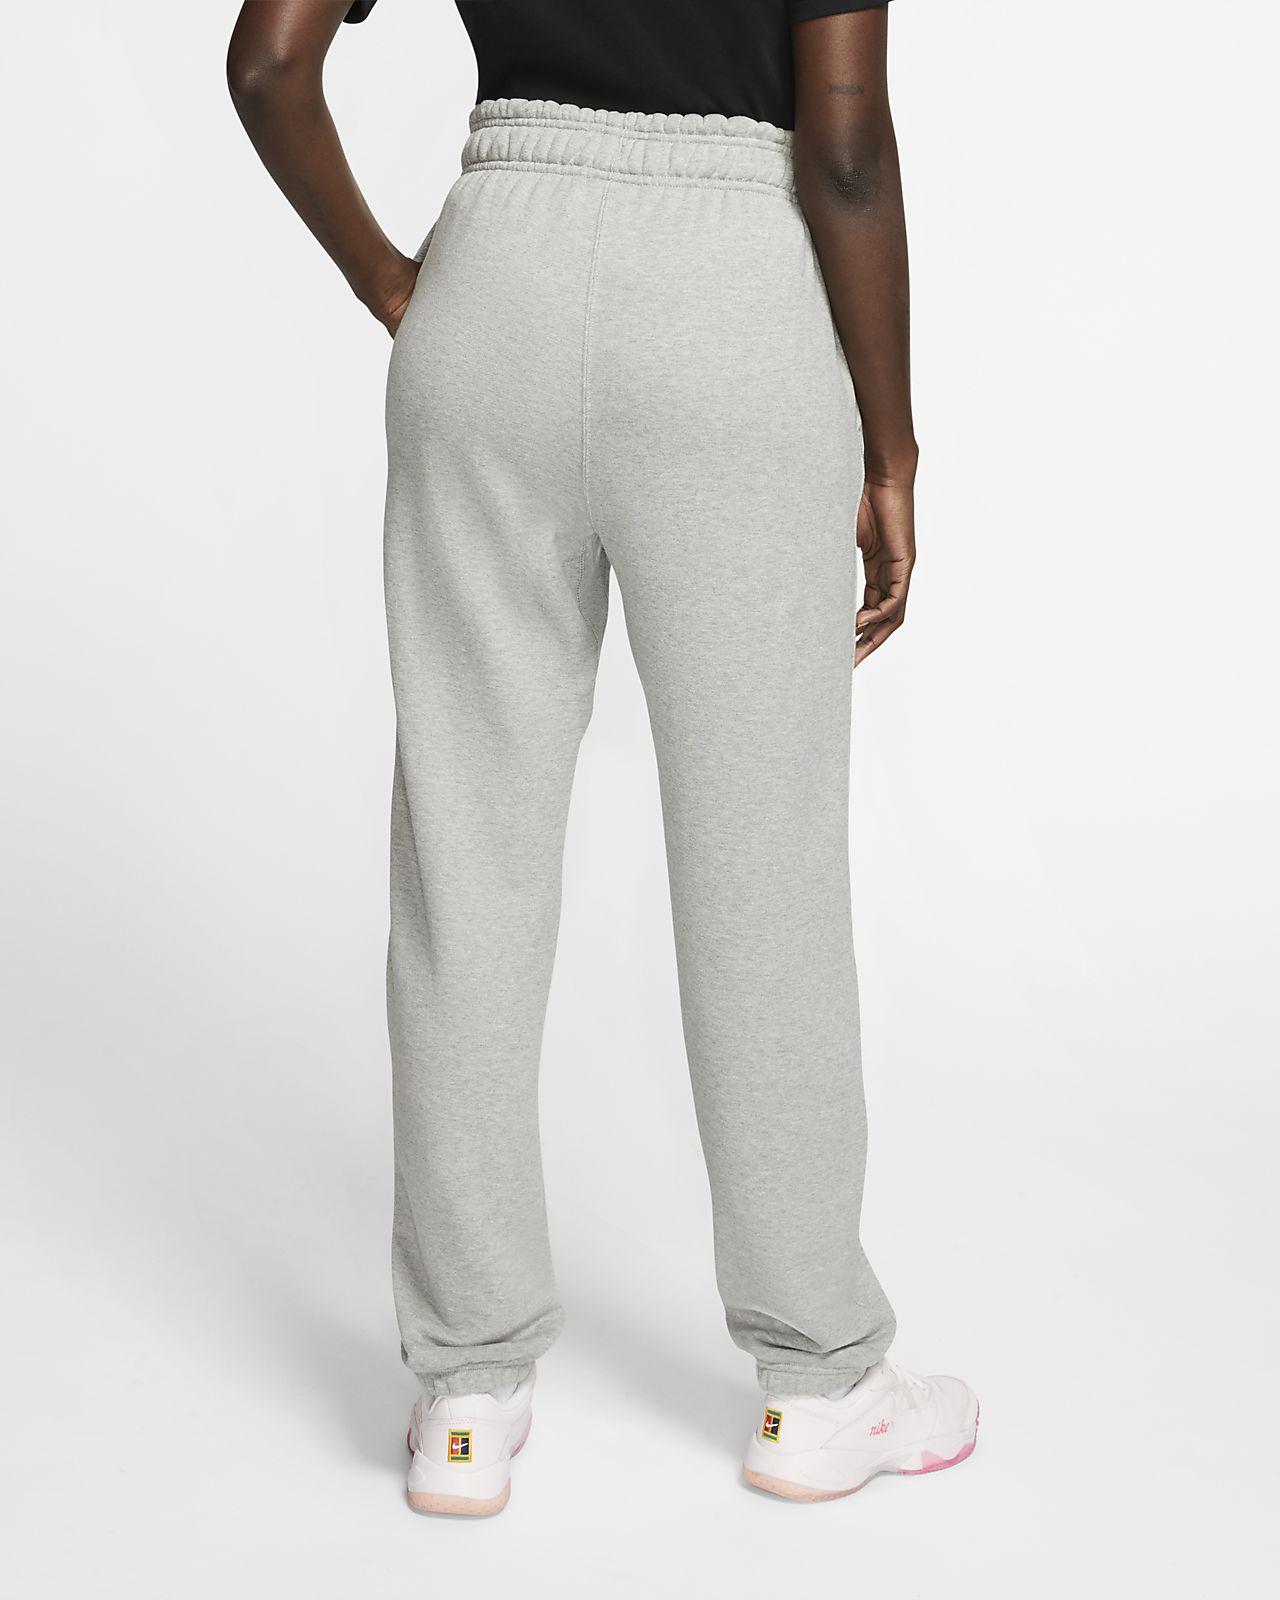 pantaloni nike donna tennis